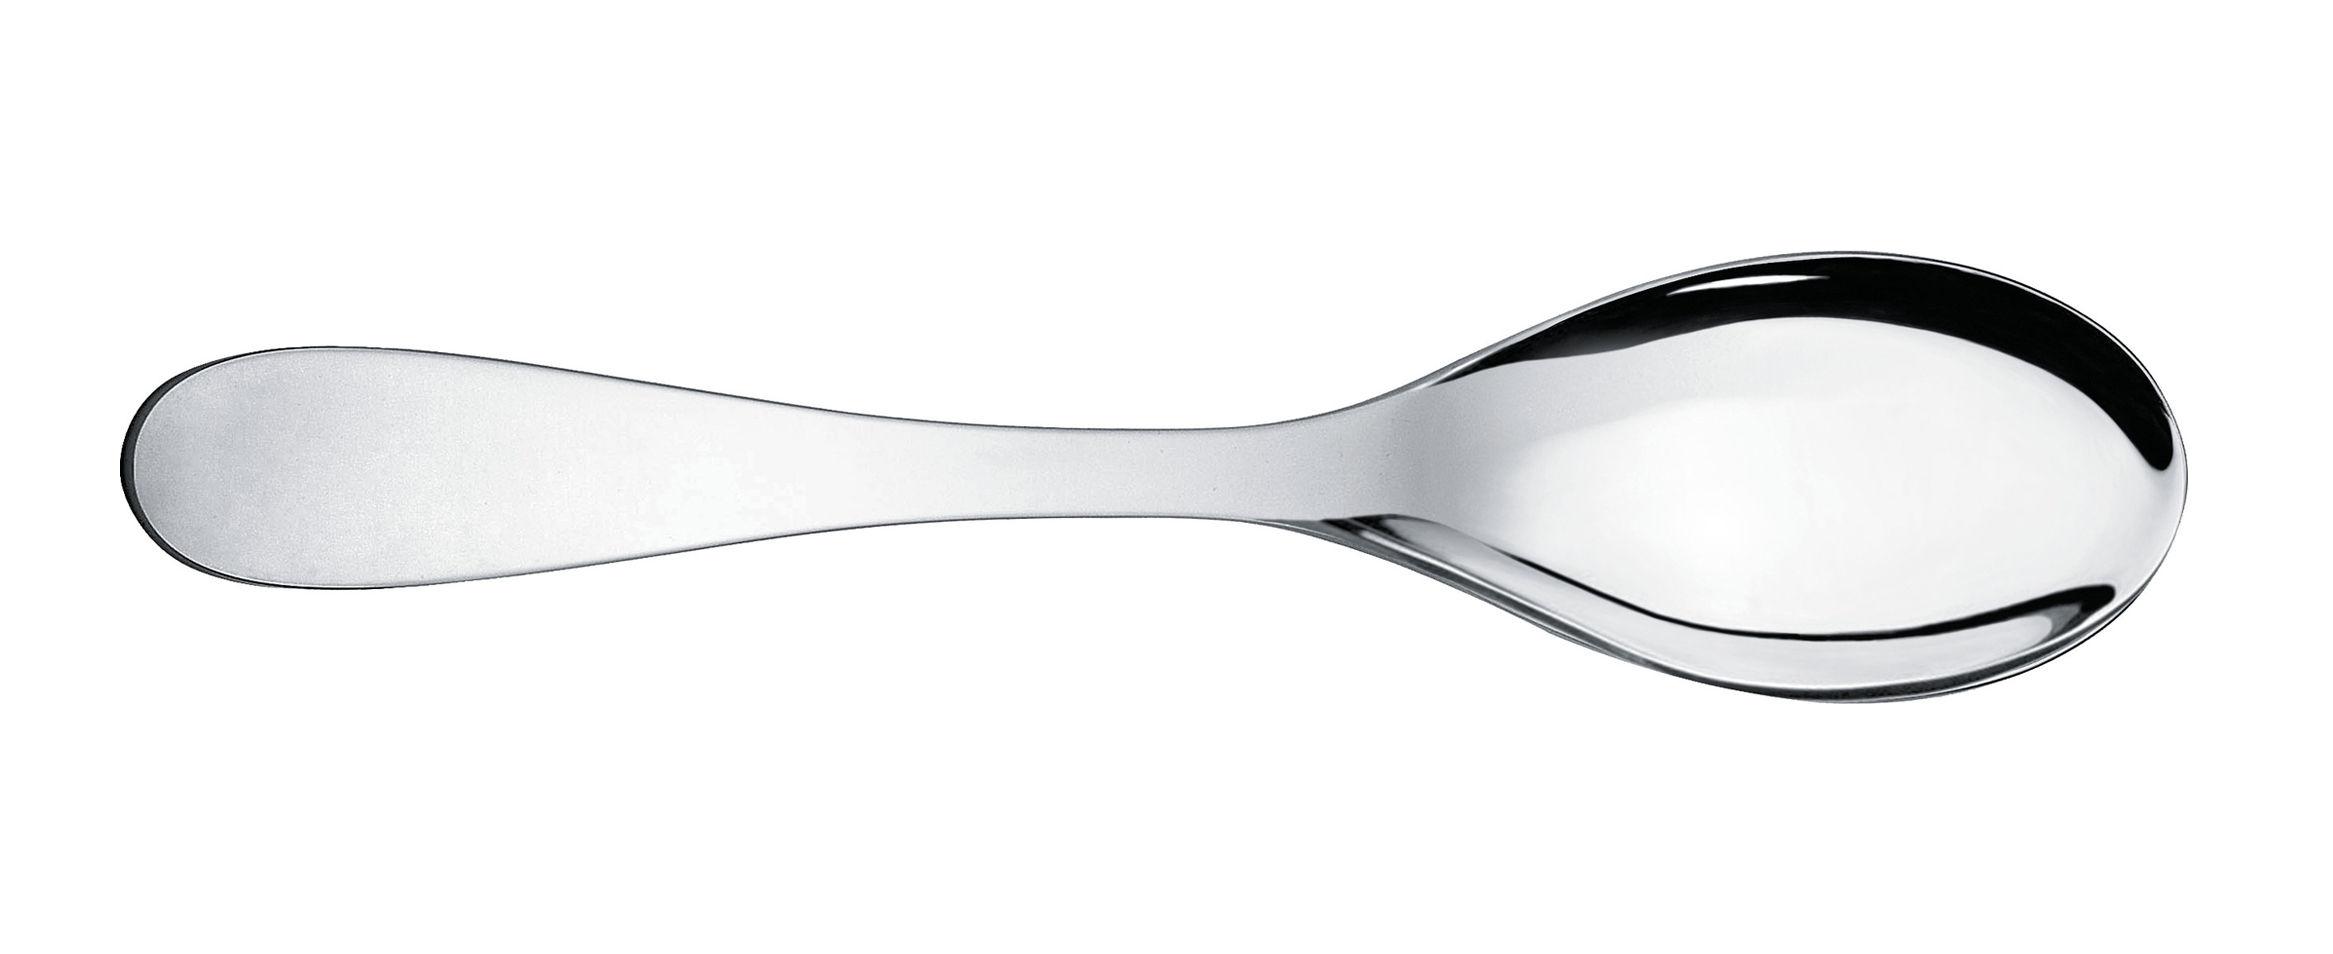 Arts de la table - Couverts de service - Cuillère de service Eat.it - Alessi - Métal brillant - Acier inoxydable 18/10